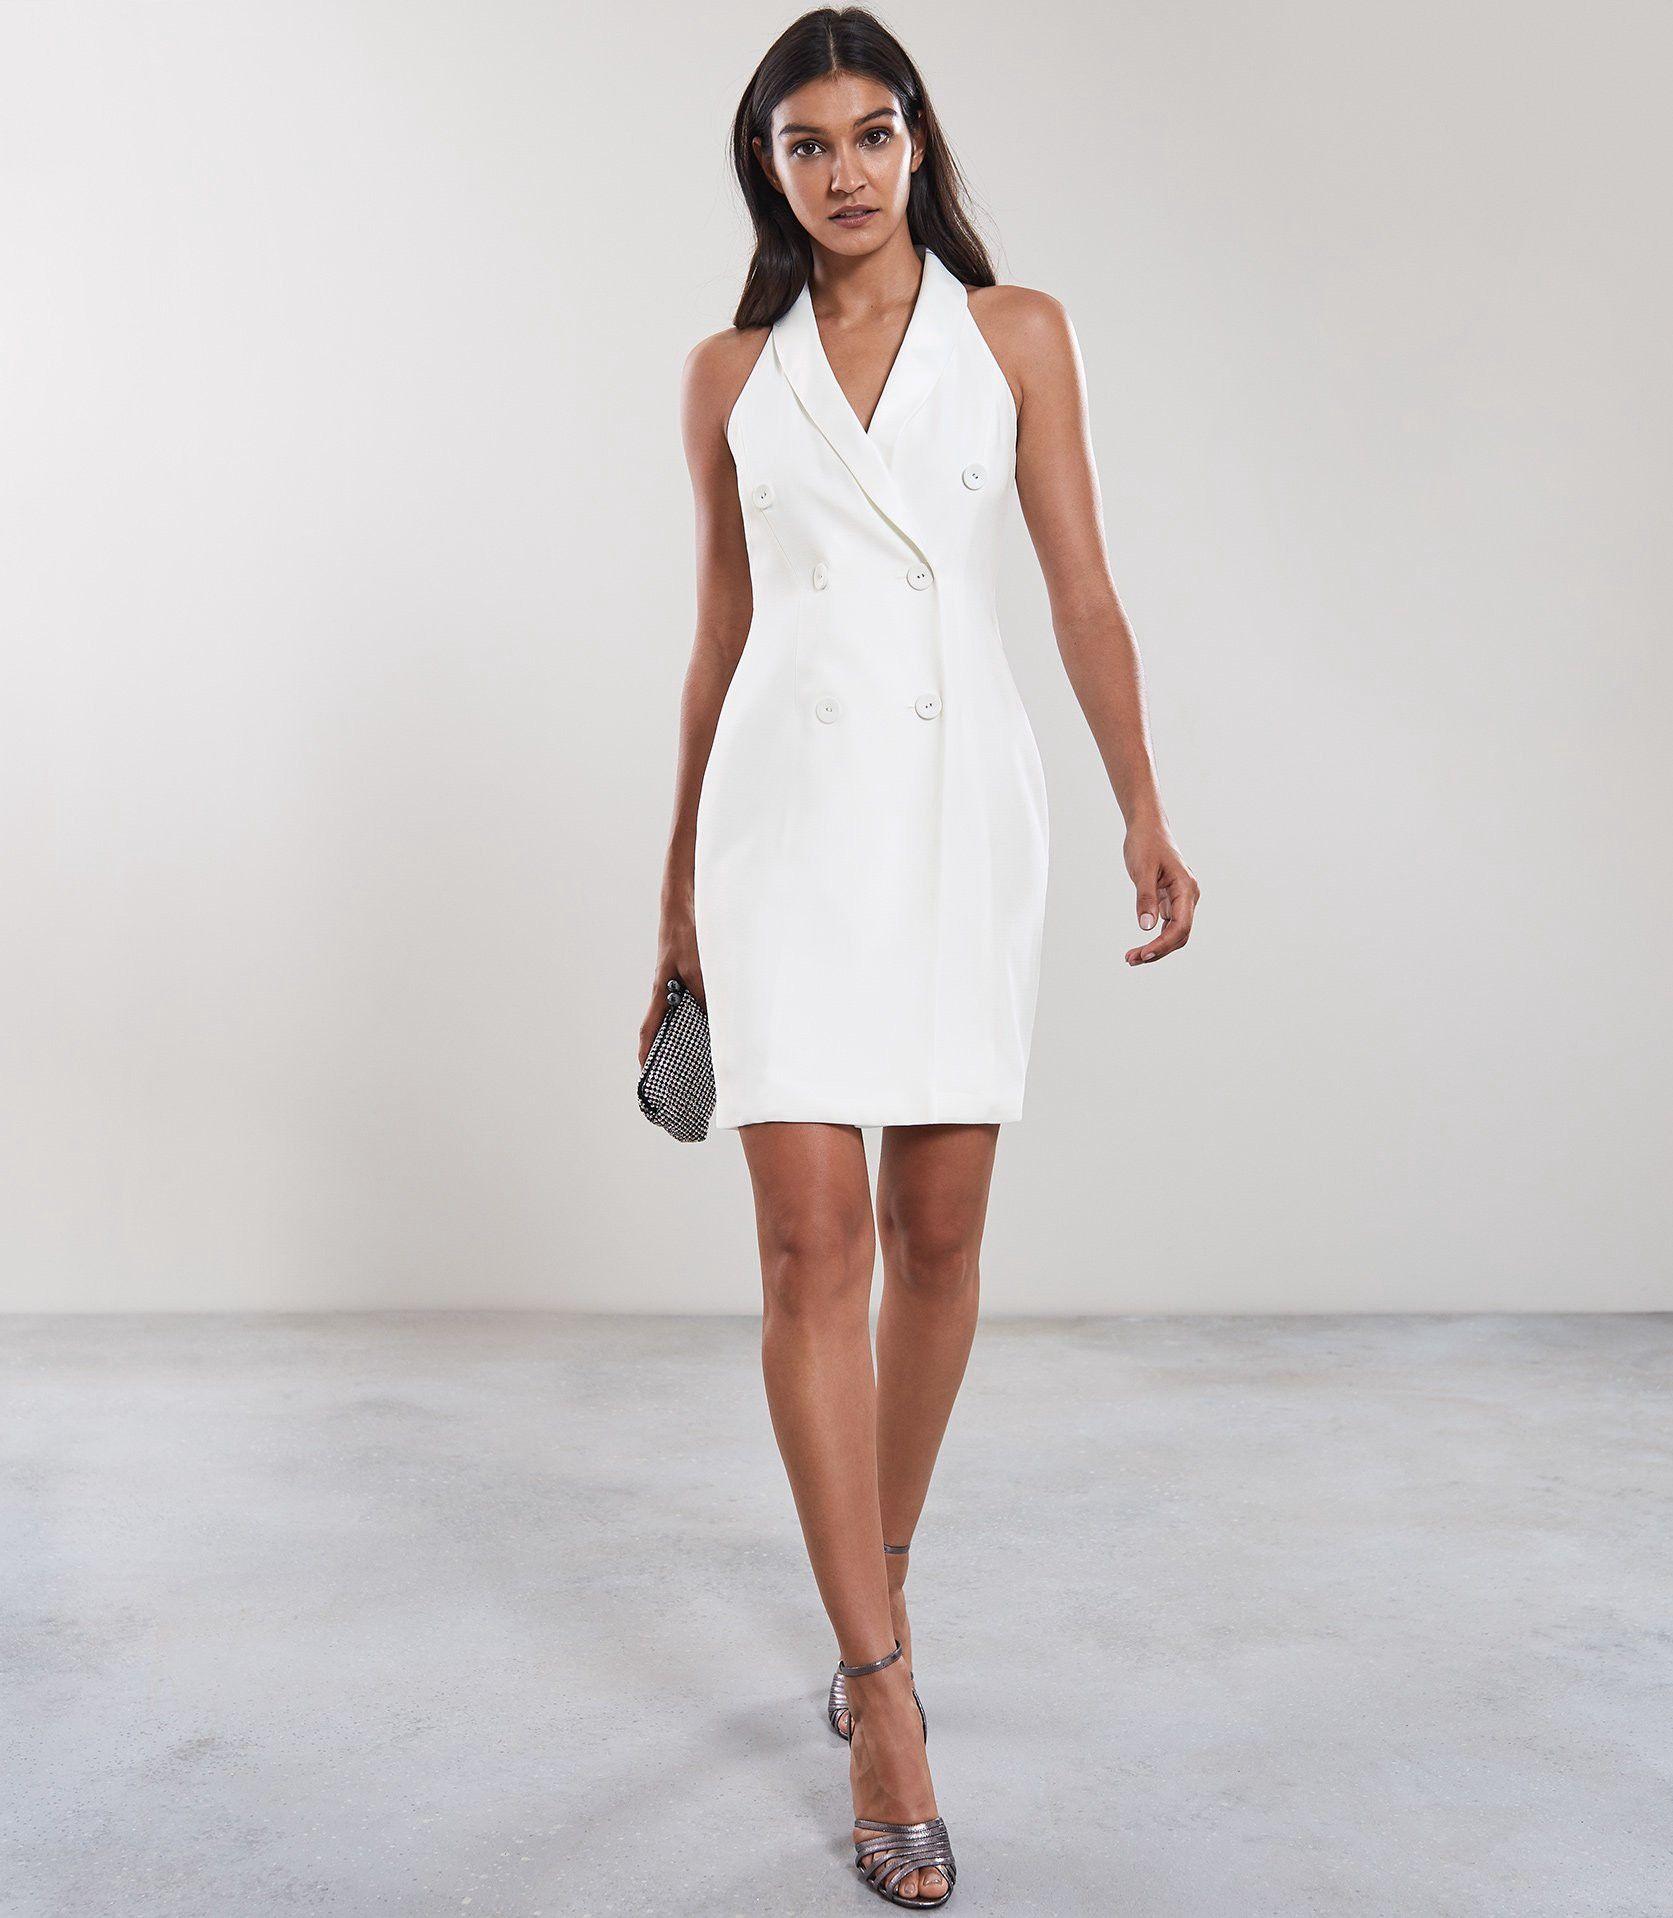 Reiss Sinead Sleeveless Tuxedo Dress Off White 10 Iconic Dresses Blazer Dress Outfits Fashion [ 1918 x 1673 Pixel ]